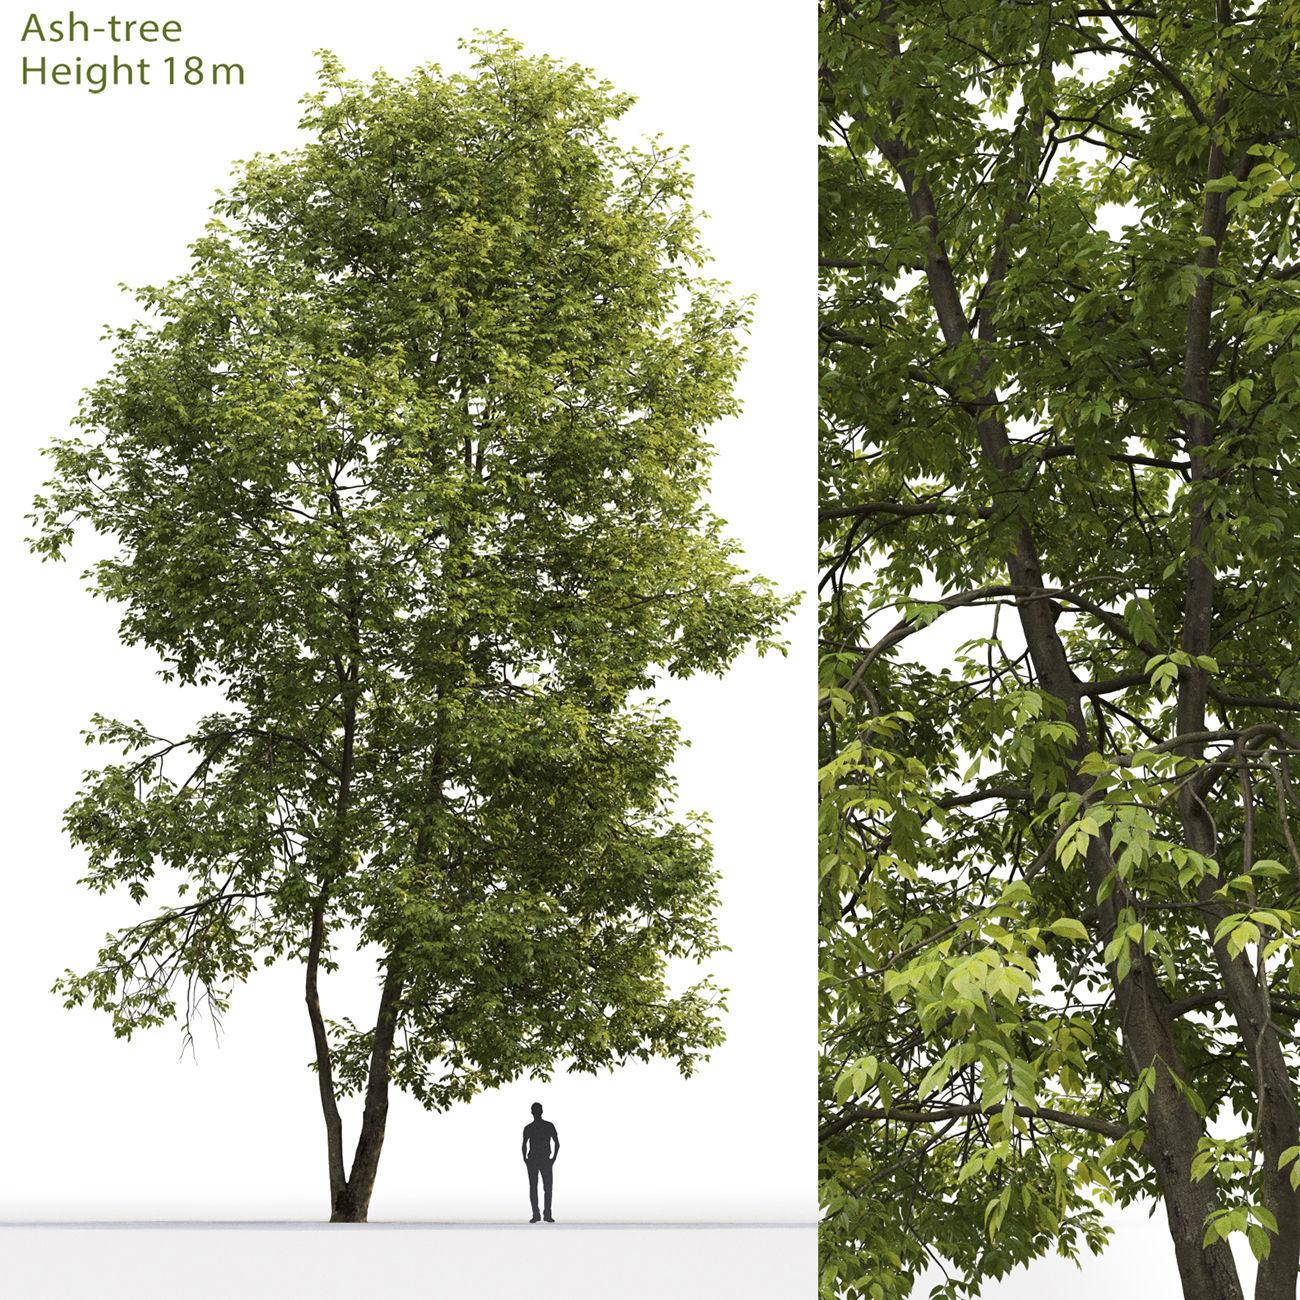 Ash-tree 04 H18m